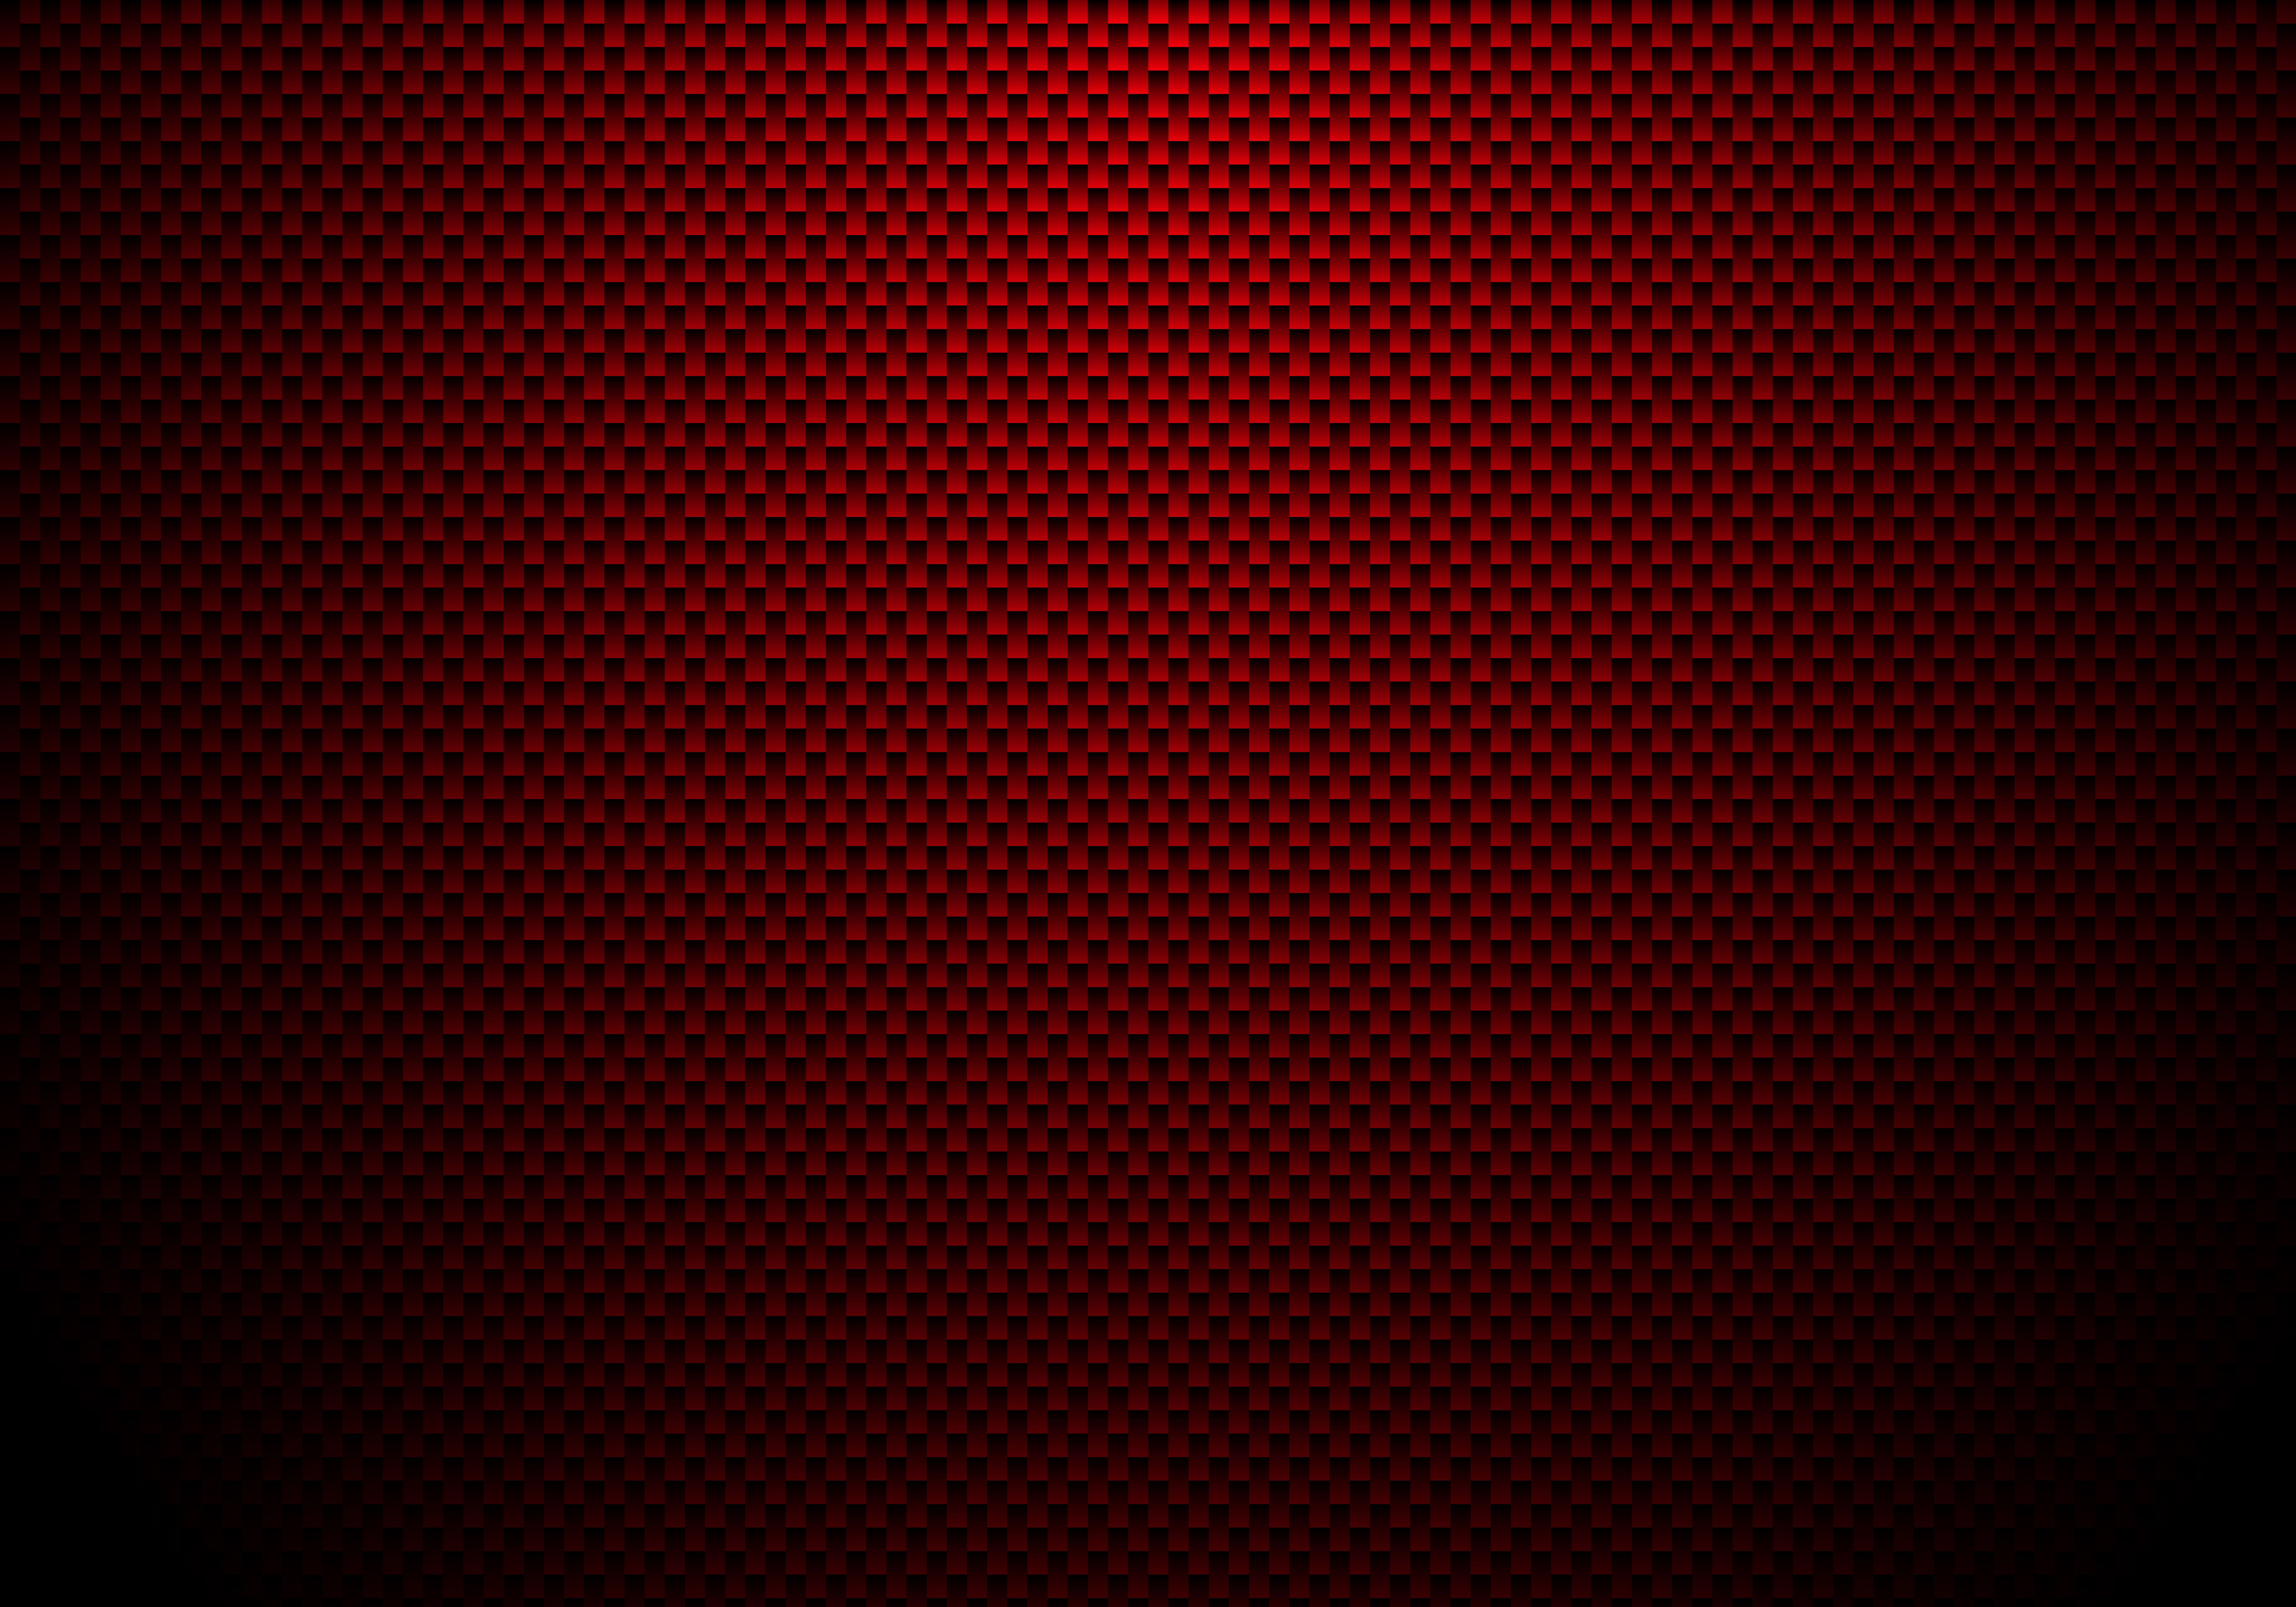 Orange Carbon Fiber Wallpapers - Top Free Orange Carbon ...